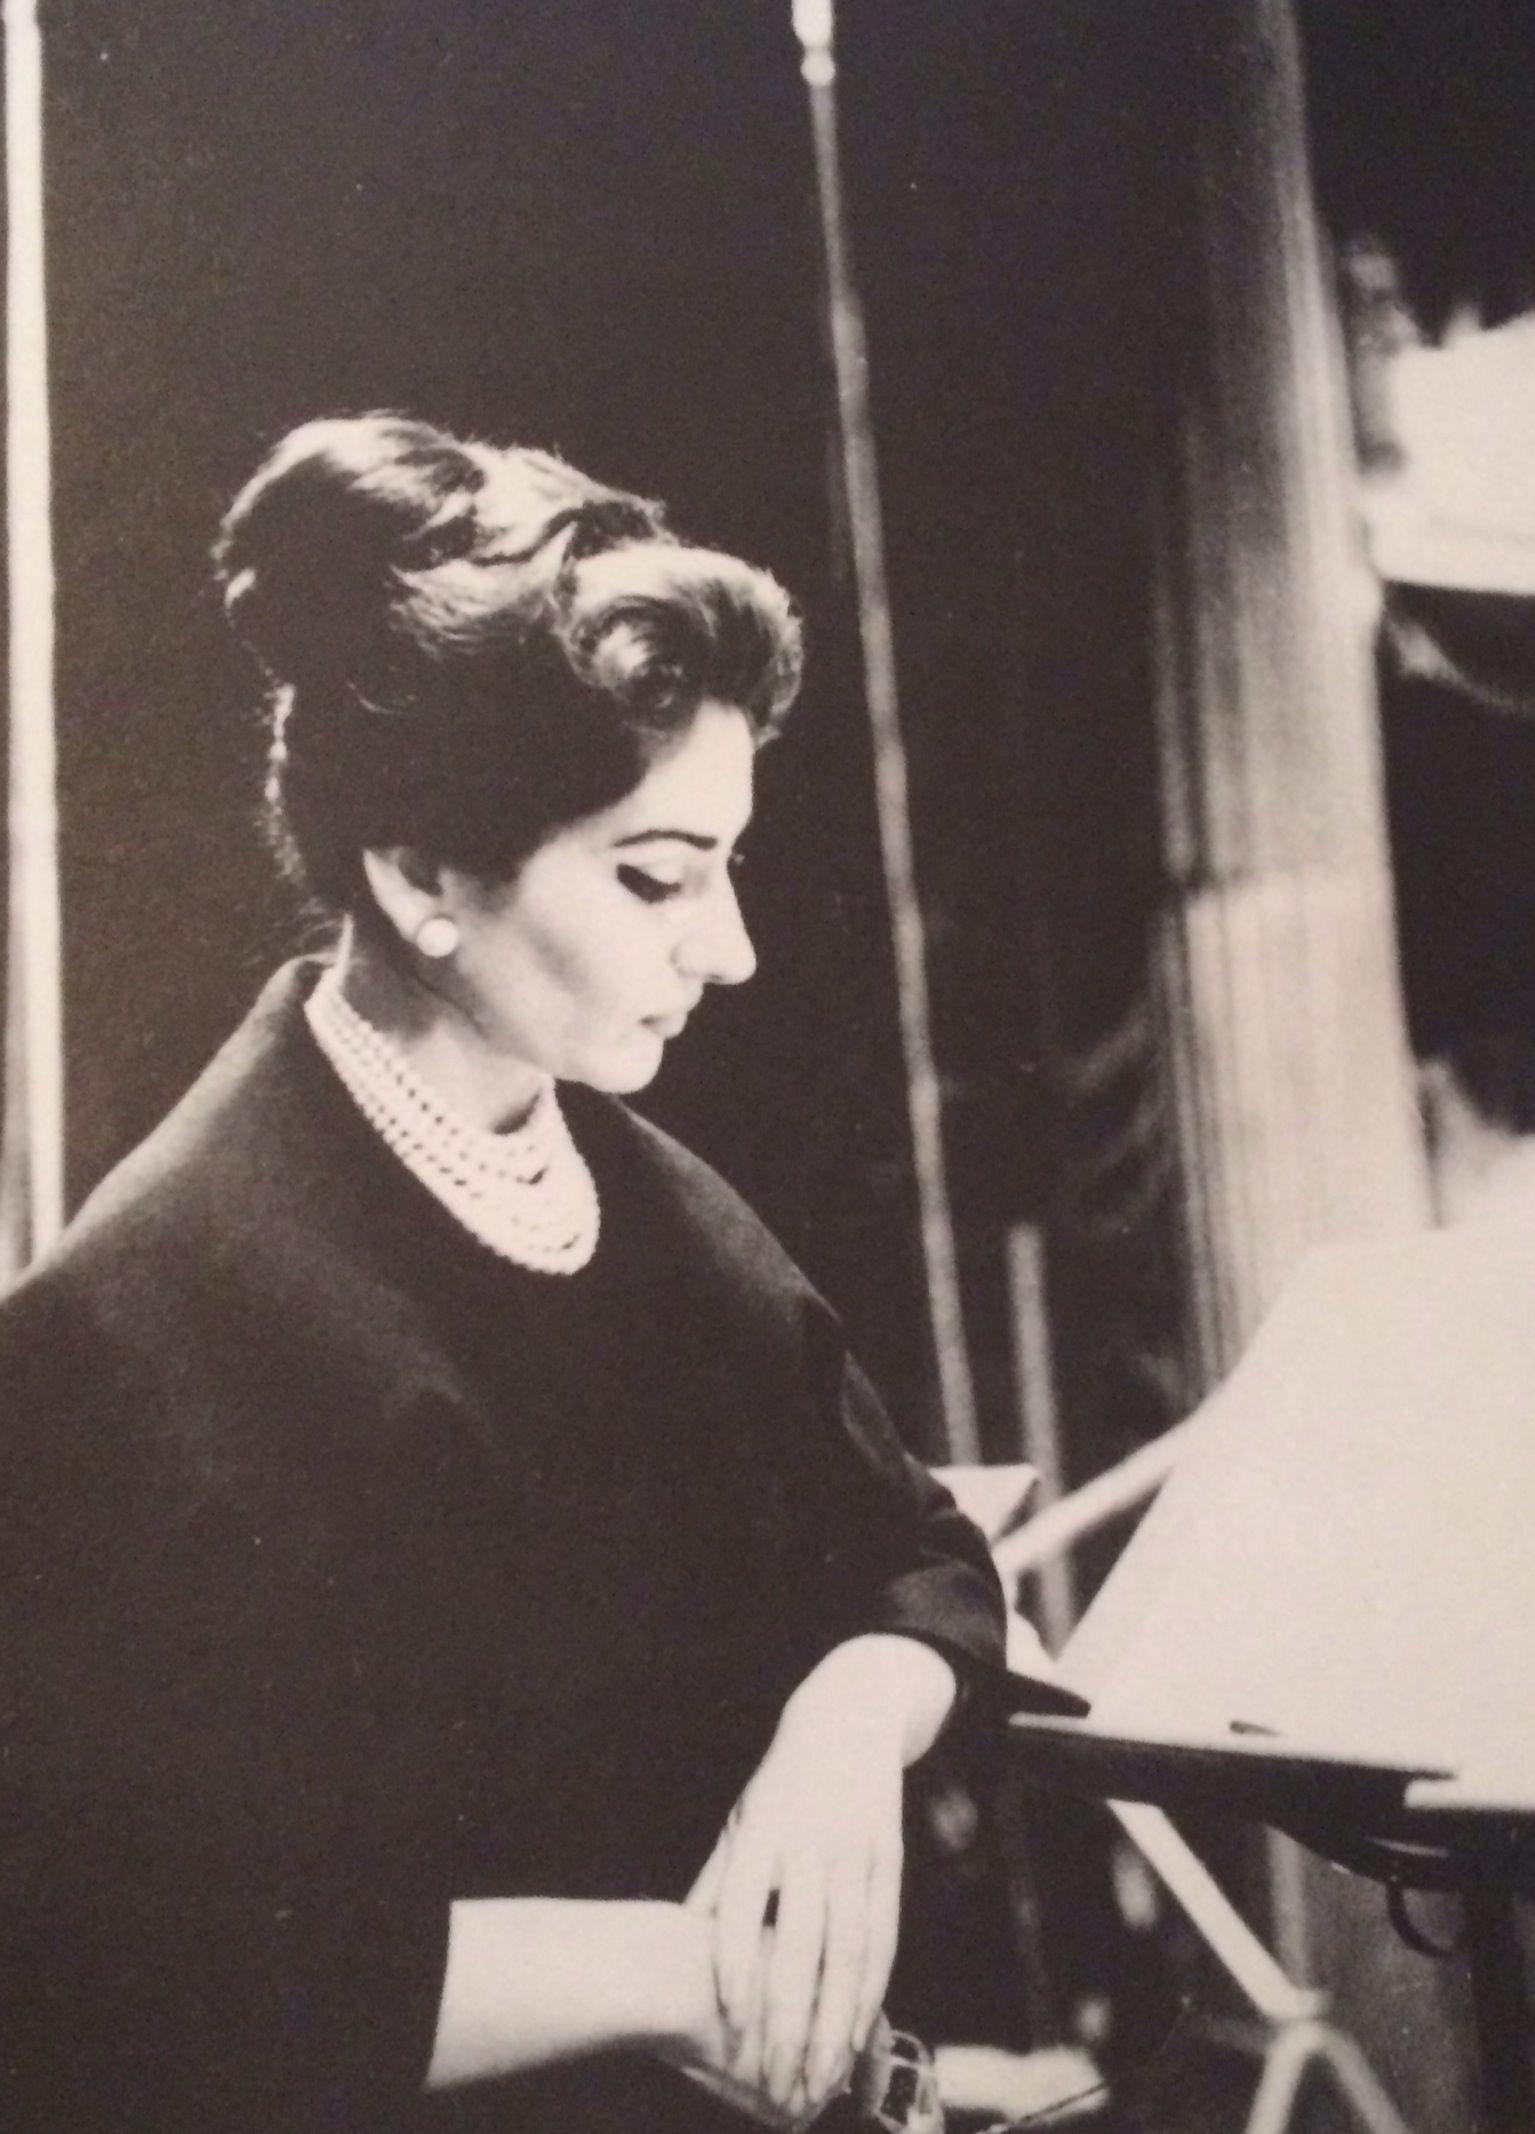 Maria Callas - 1959 during the recording of La Gioconda.